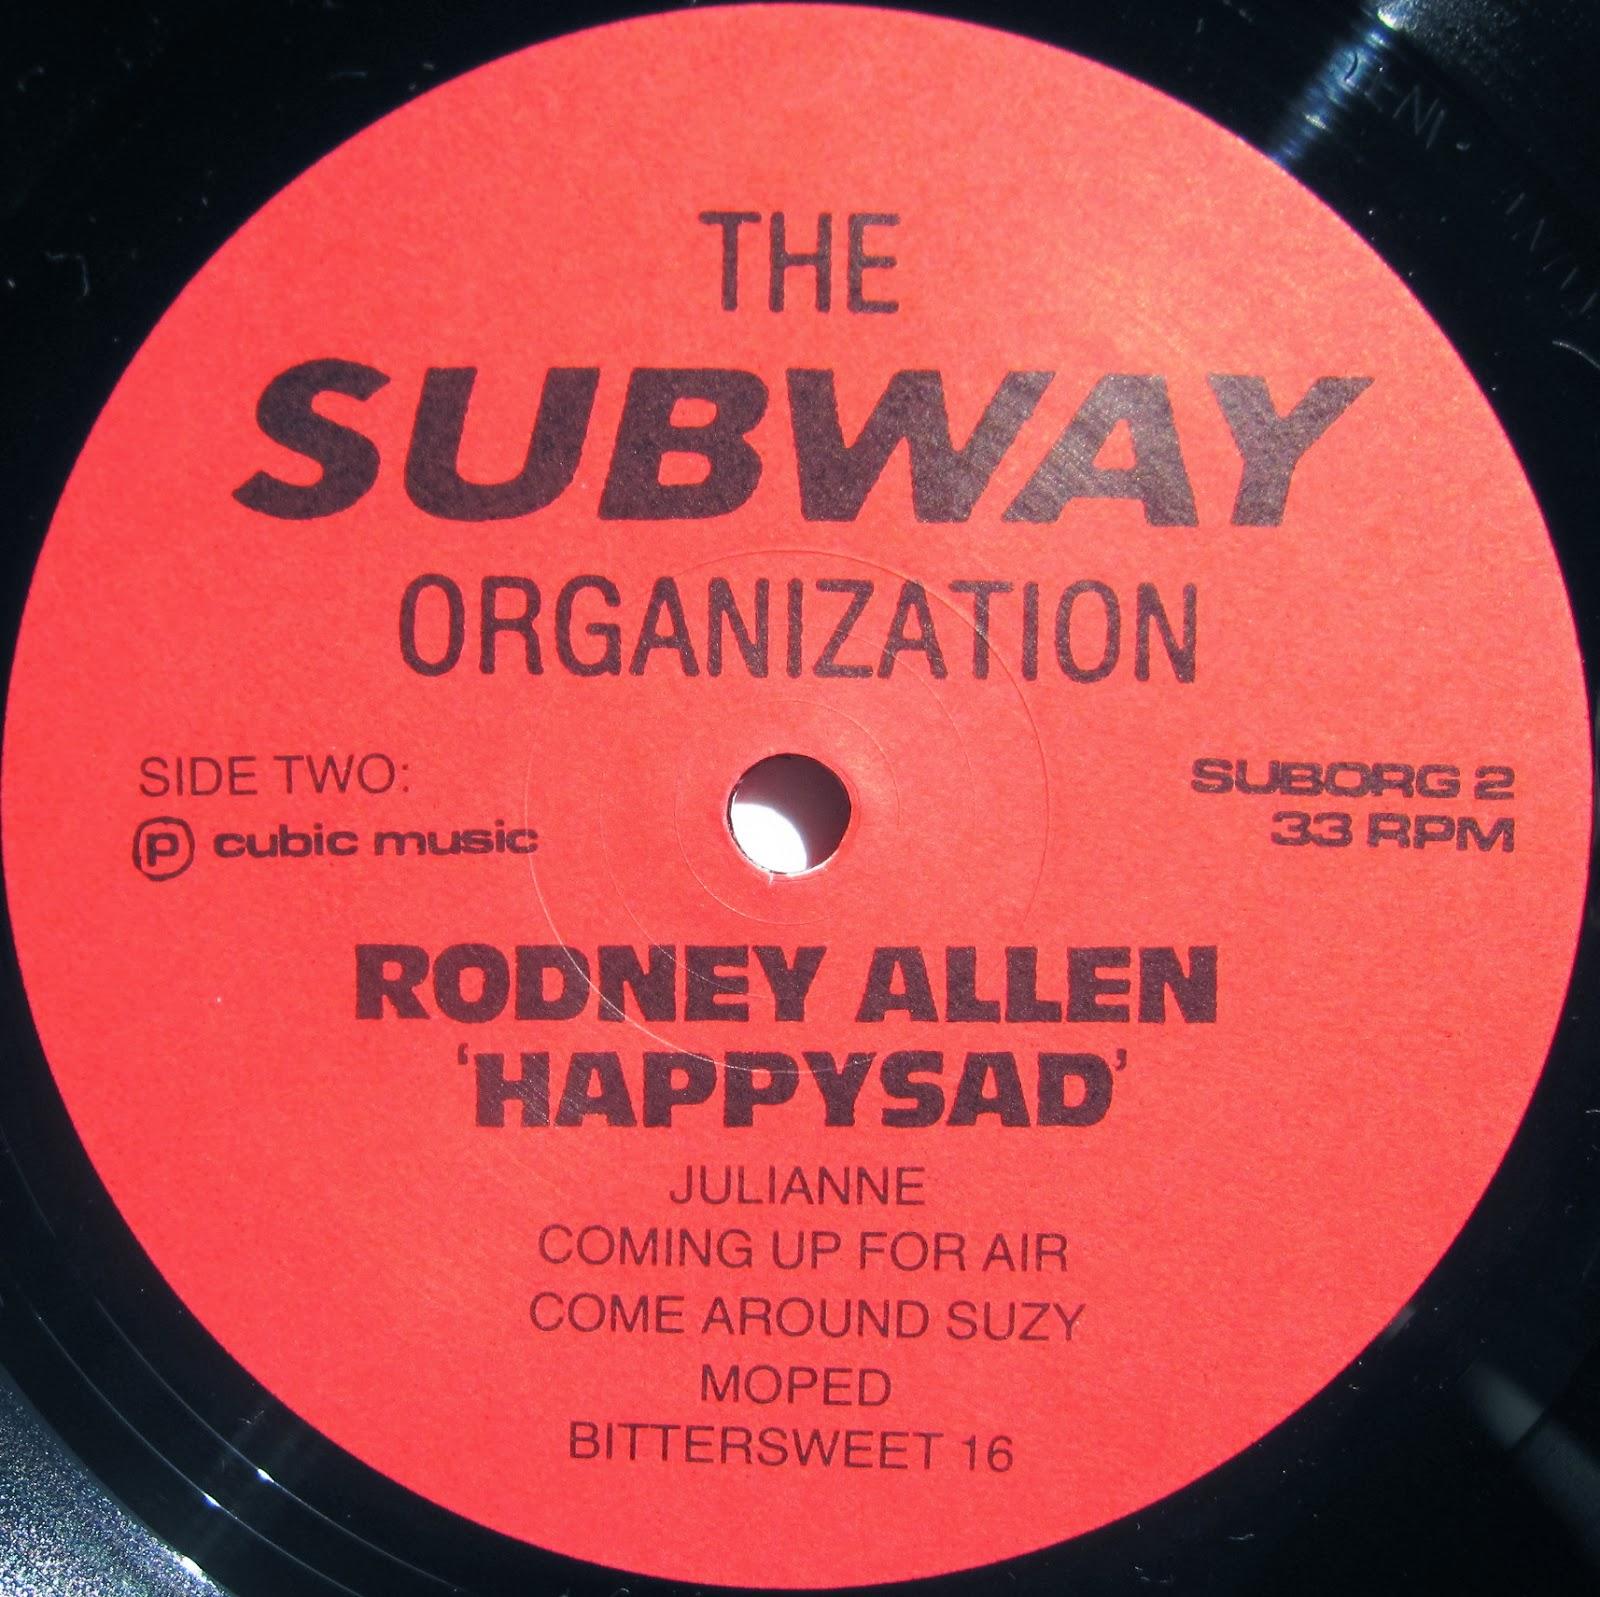 Rodney Allen Happysad